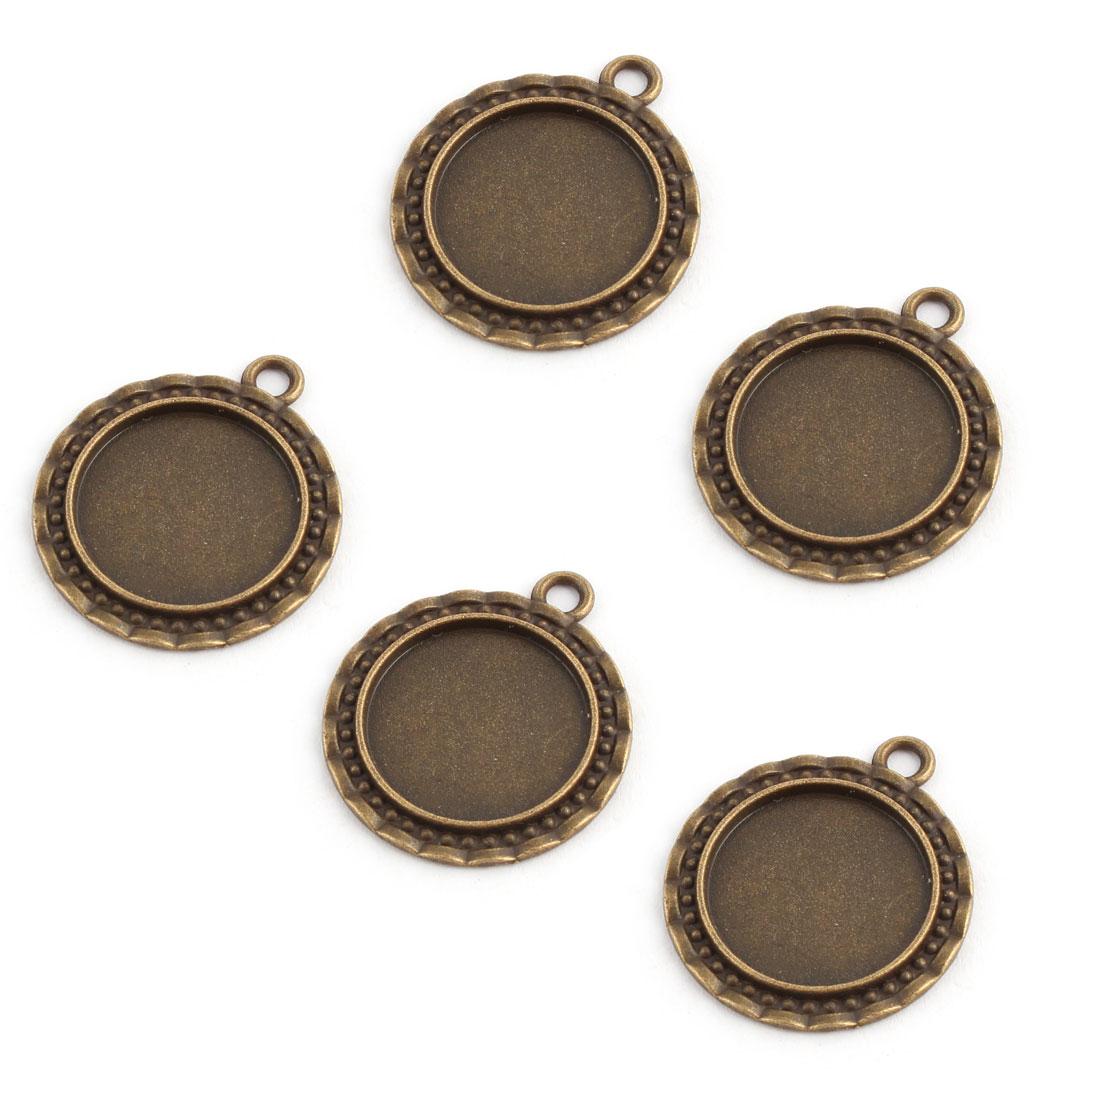 Photo Jewelry Copper Alloy Retro Style Cameos Bezel Pendant Trays Ornament Bronze Tone 20mm Inner Dia 5pcs